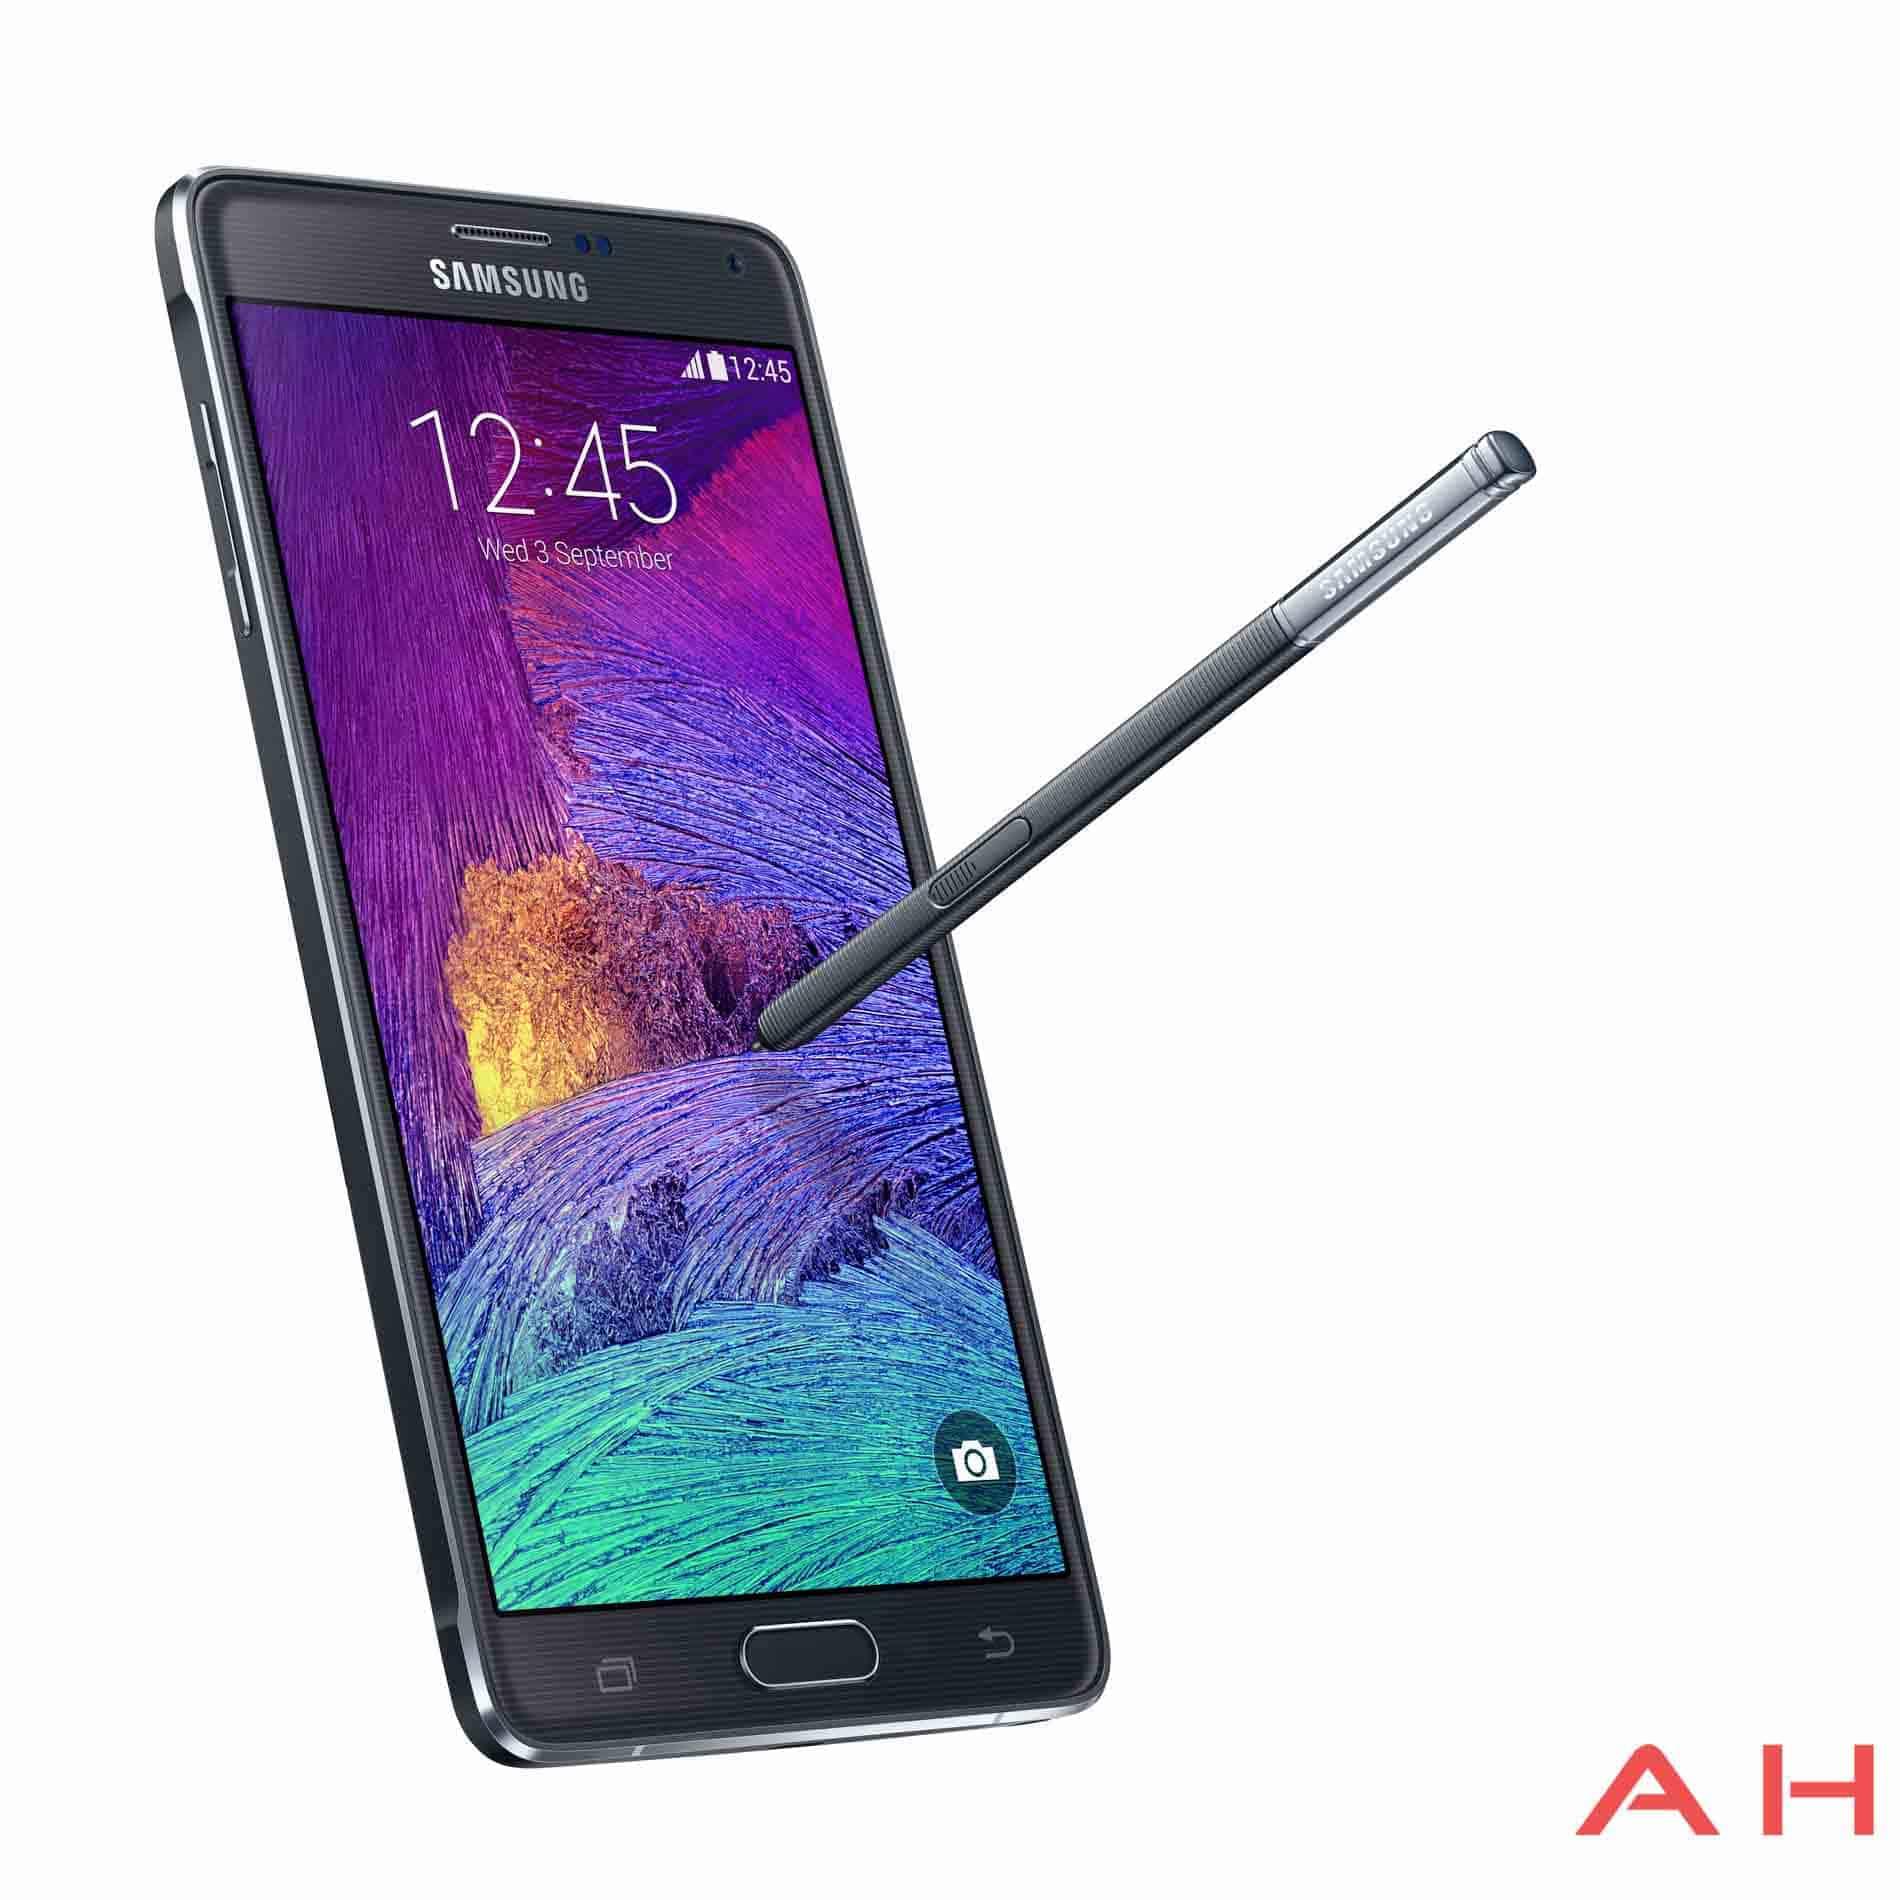 Samsung-Galaxy-Note-4-AH-7